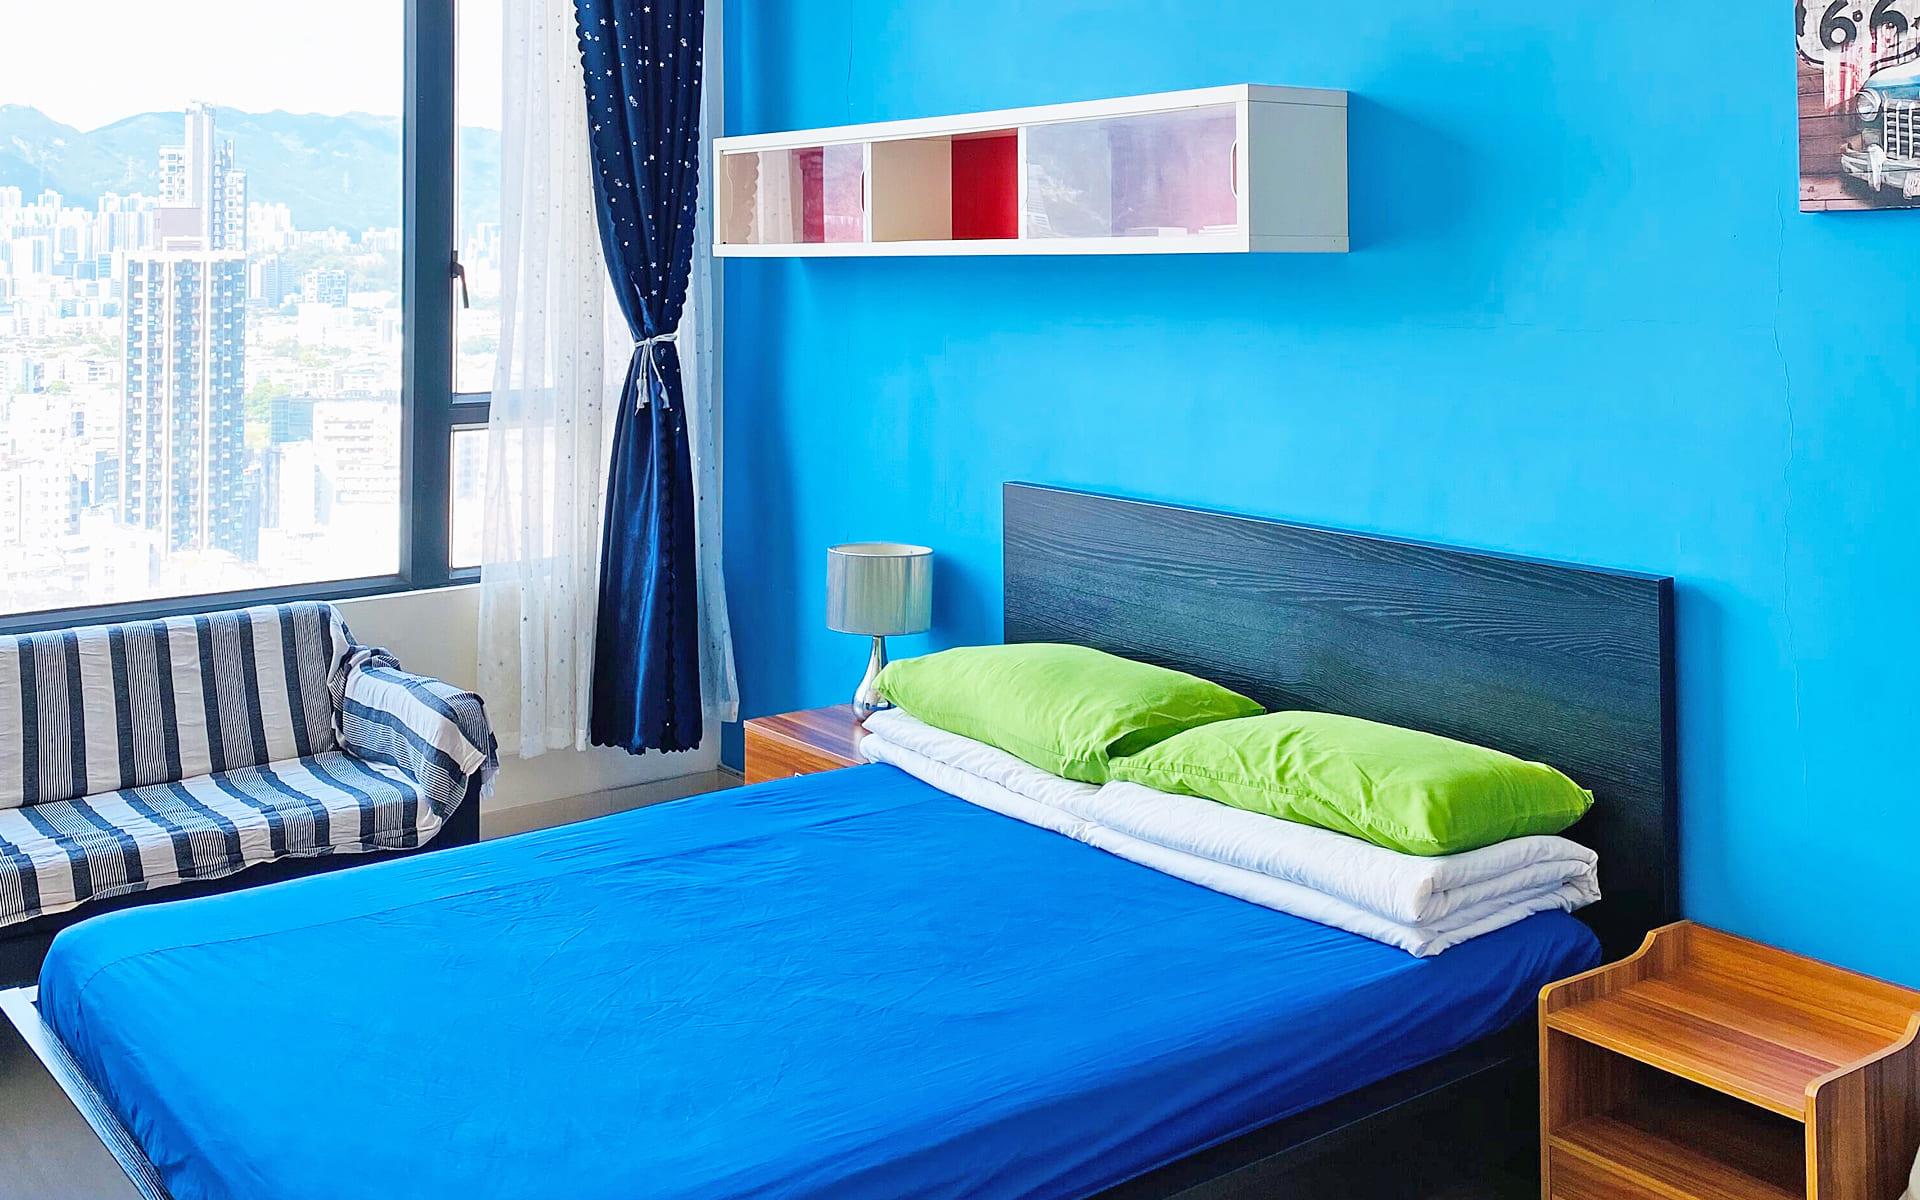 hk_service_apartment_9158888631589446596.jpg